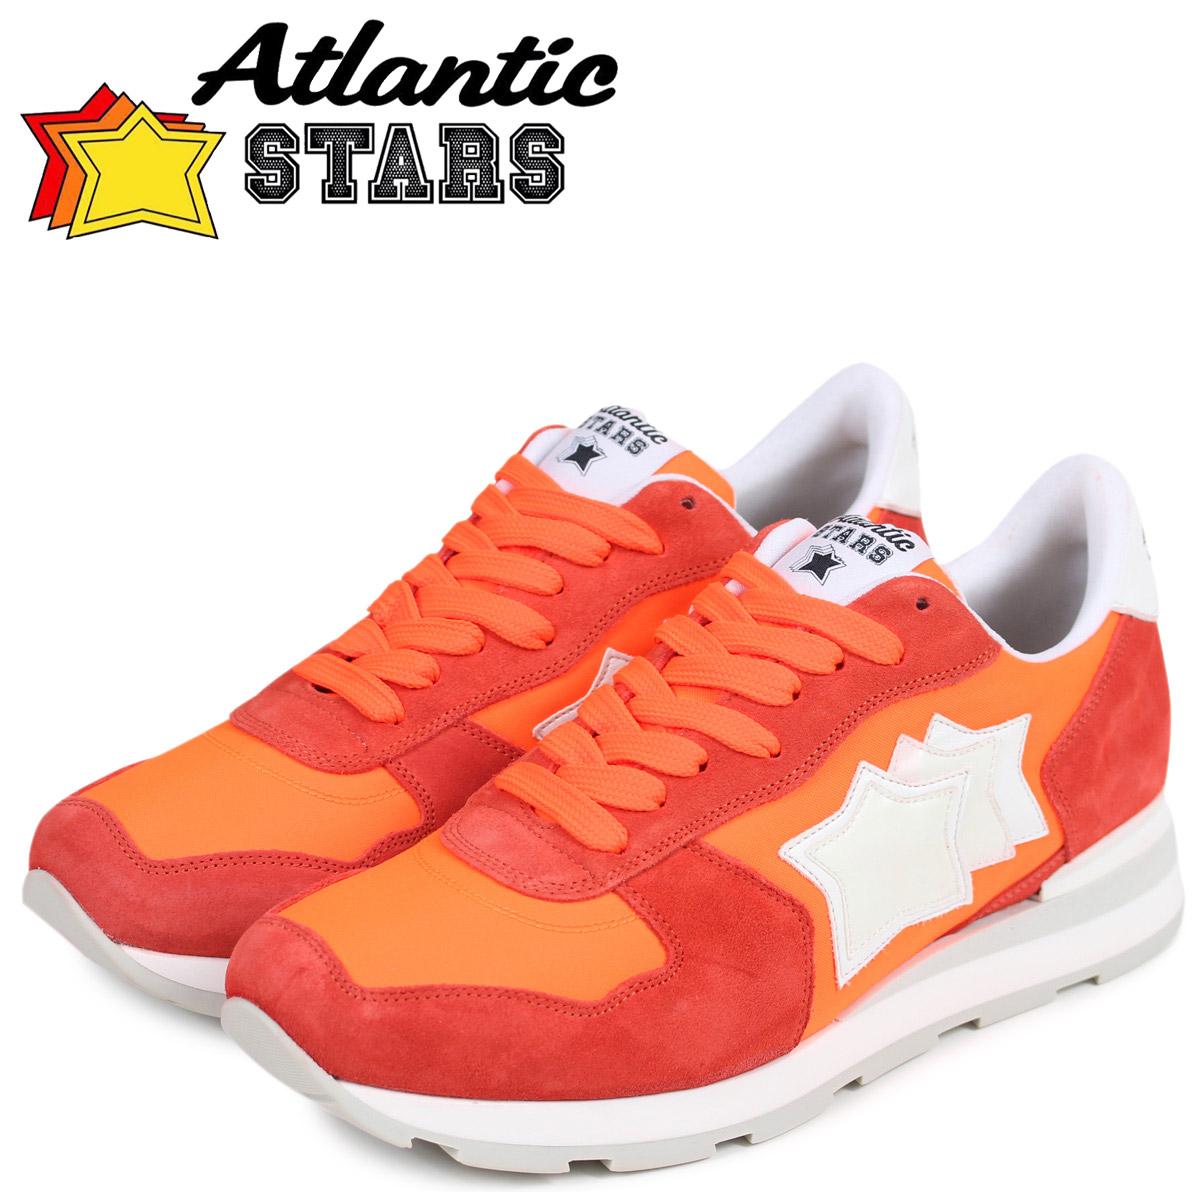 Atlantic STARS アトランティックスターズ メンズ スニーカー アンタレス ANTARES SRF-86B オレンジ 【決算セール 返品不可】